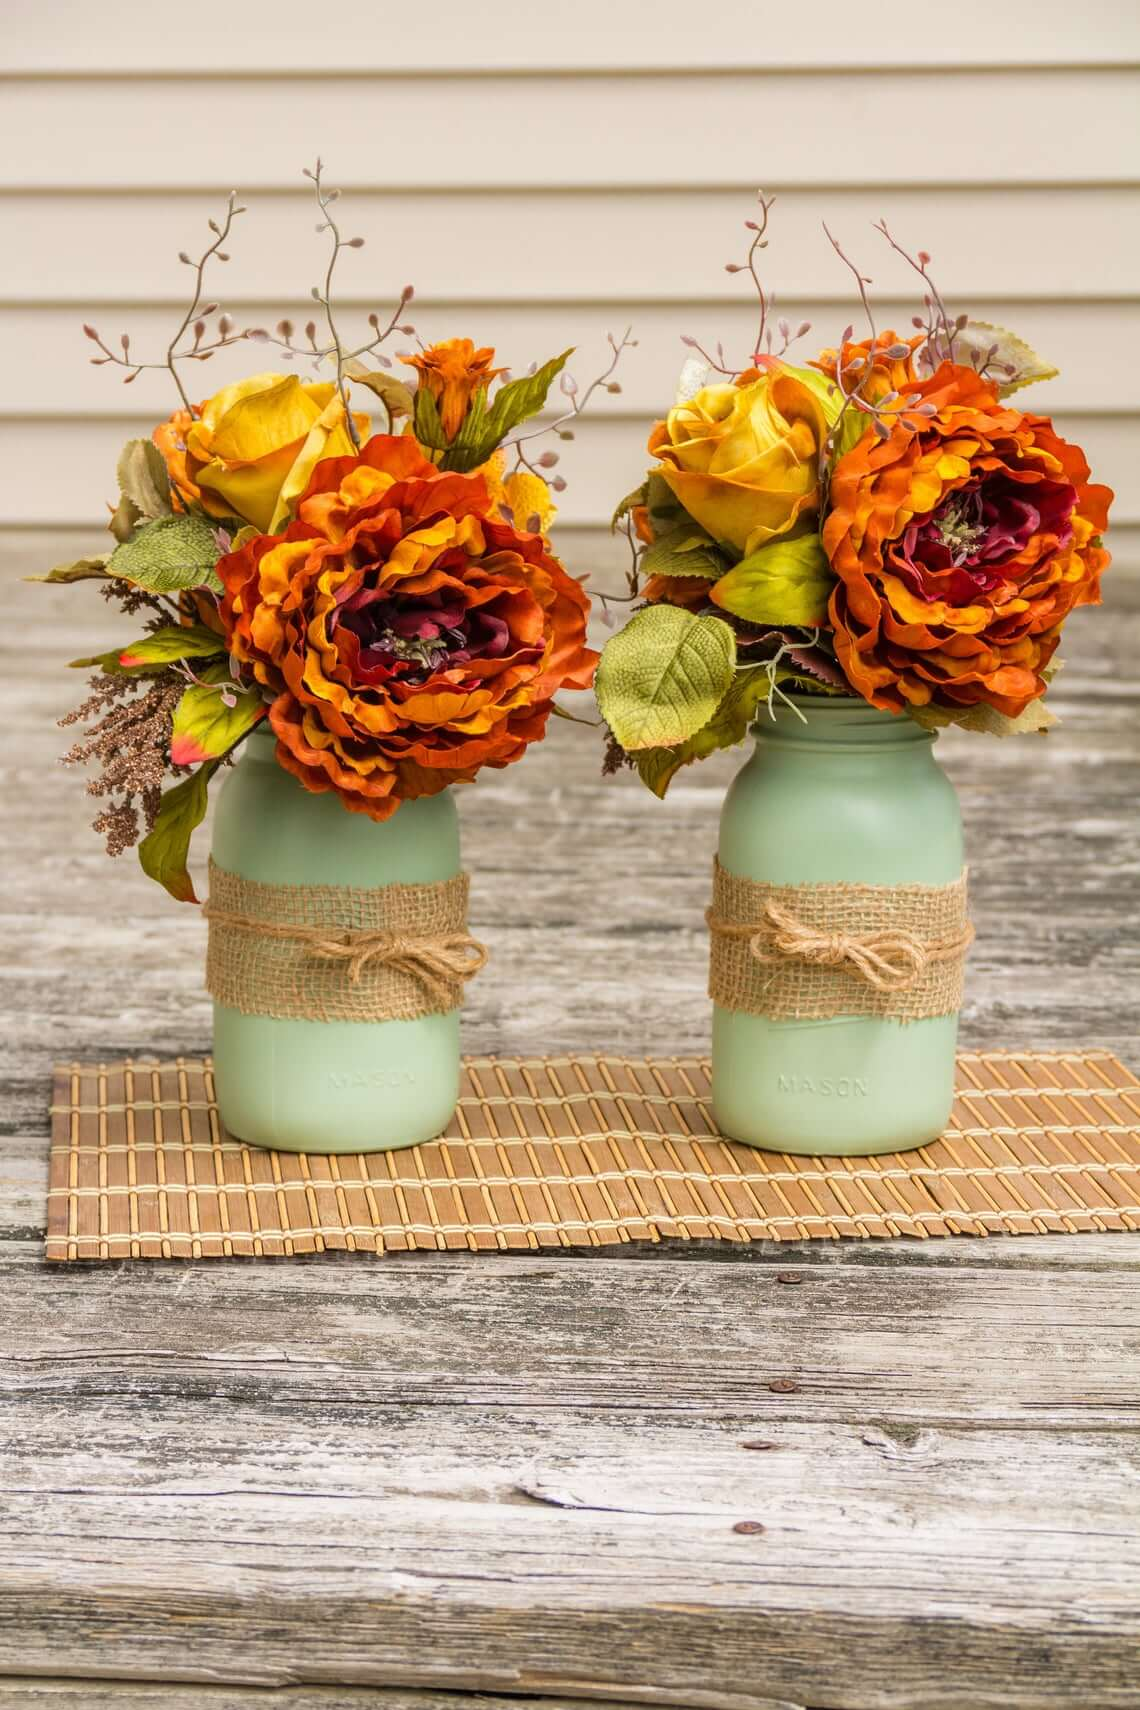 Endless Summer Bouquet in Painted Jar Vase